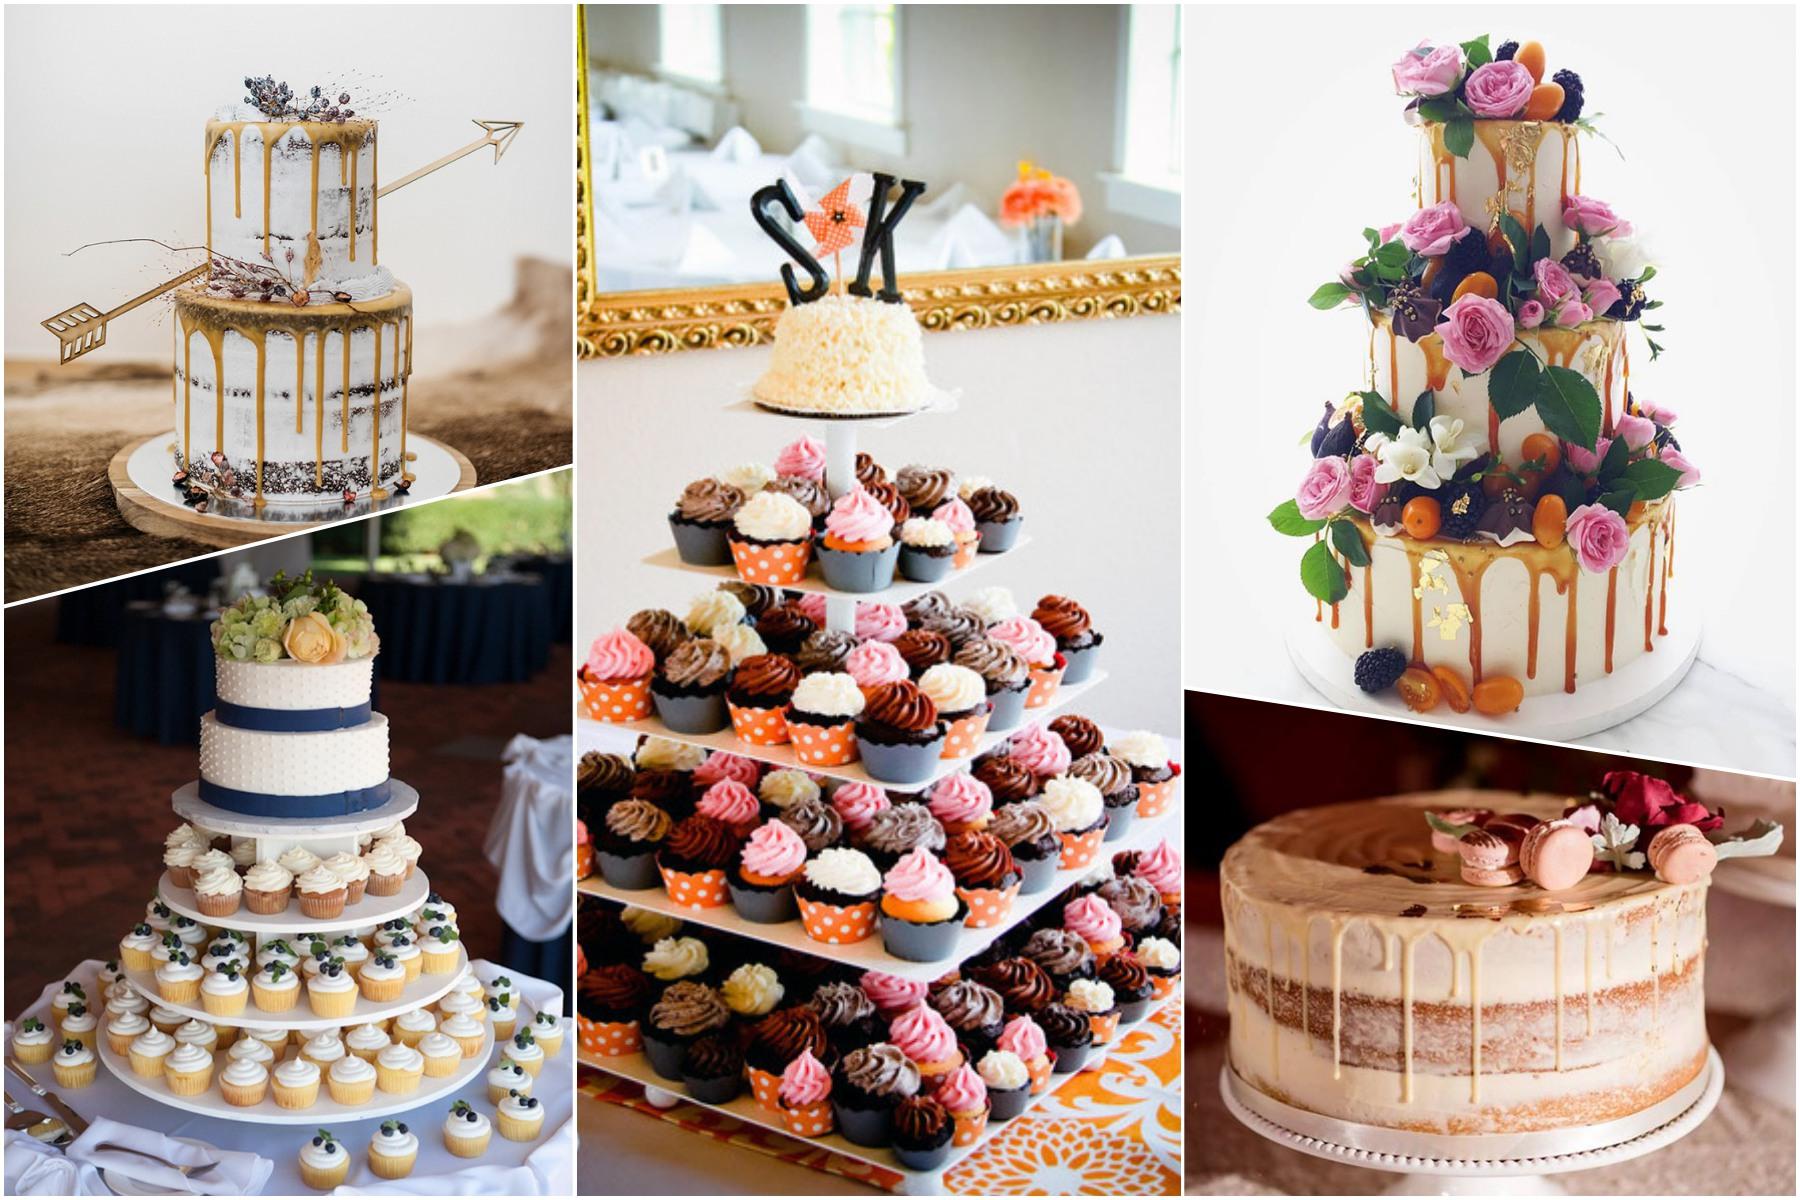 muffin cake, drip cake, naked cake